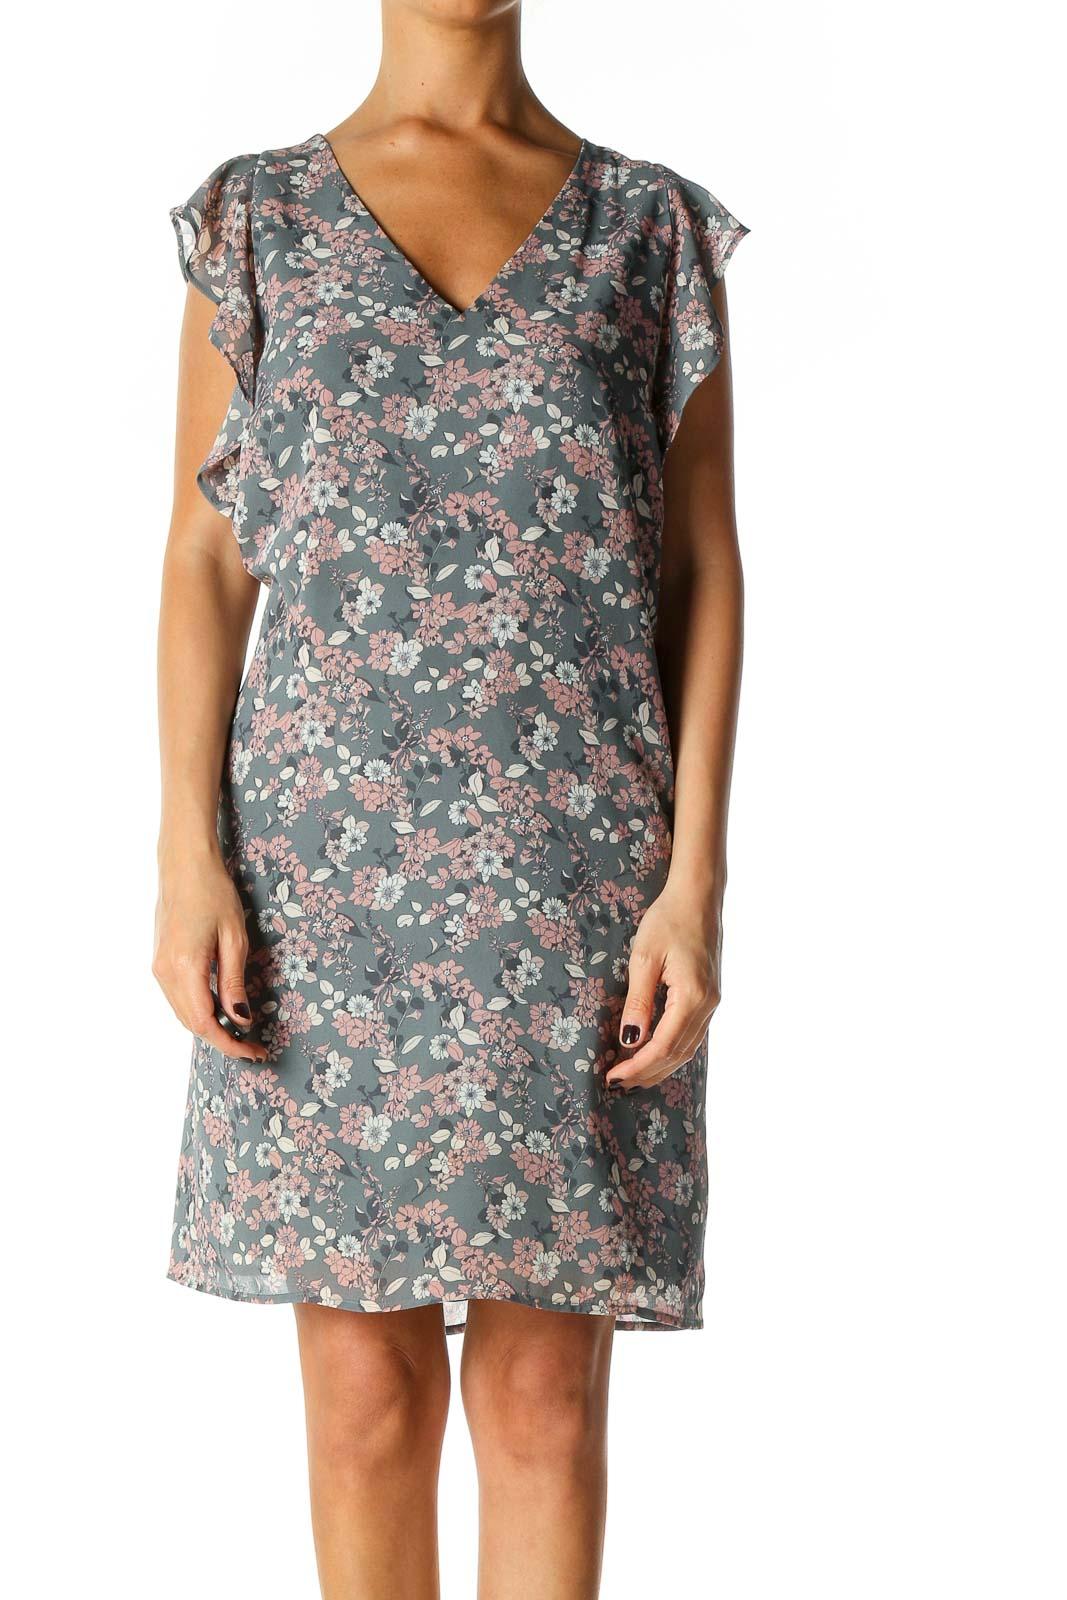 Gray Floral Print Holiday Shift Dress Front